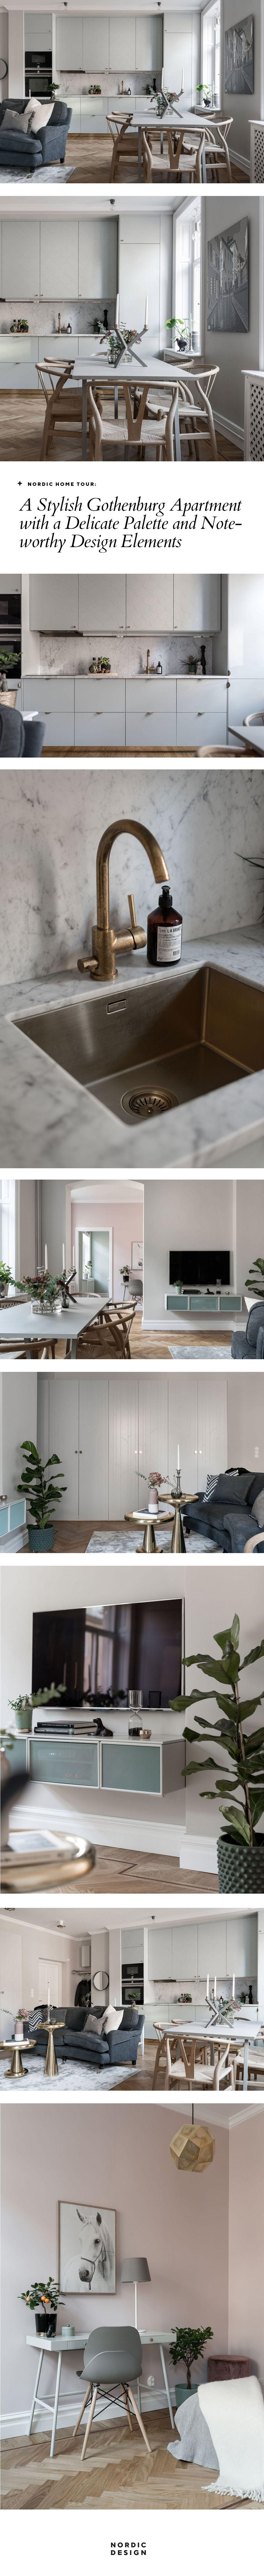 Nordic home tour: A stylish Gothenburg apartment with a delicate palette | NORDIC DESIGN